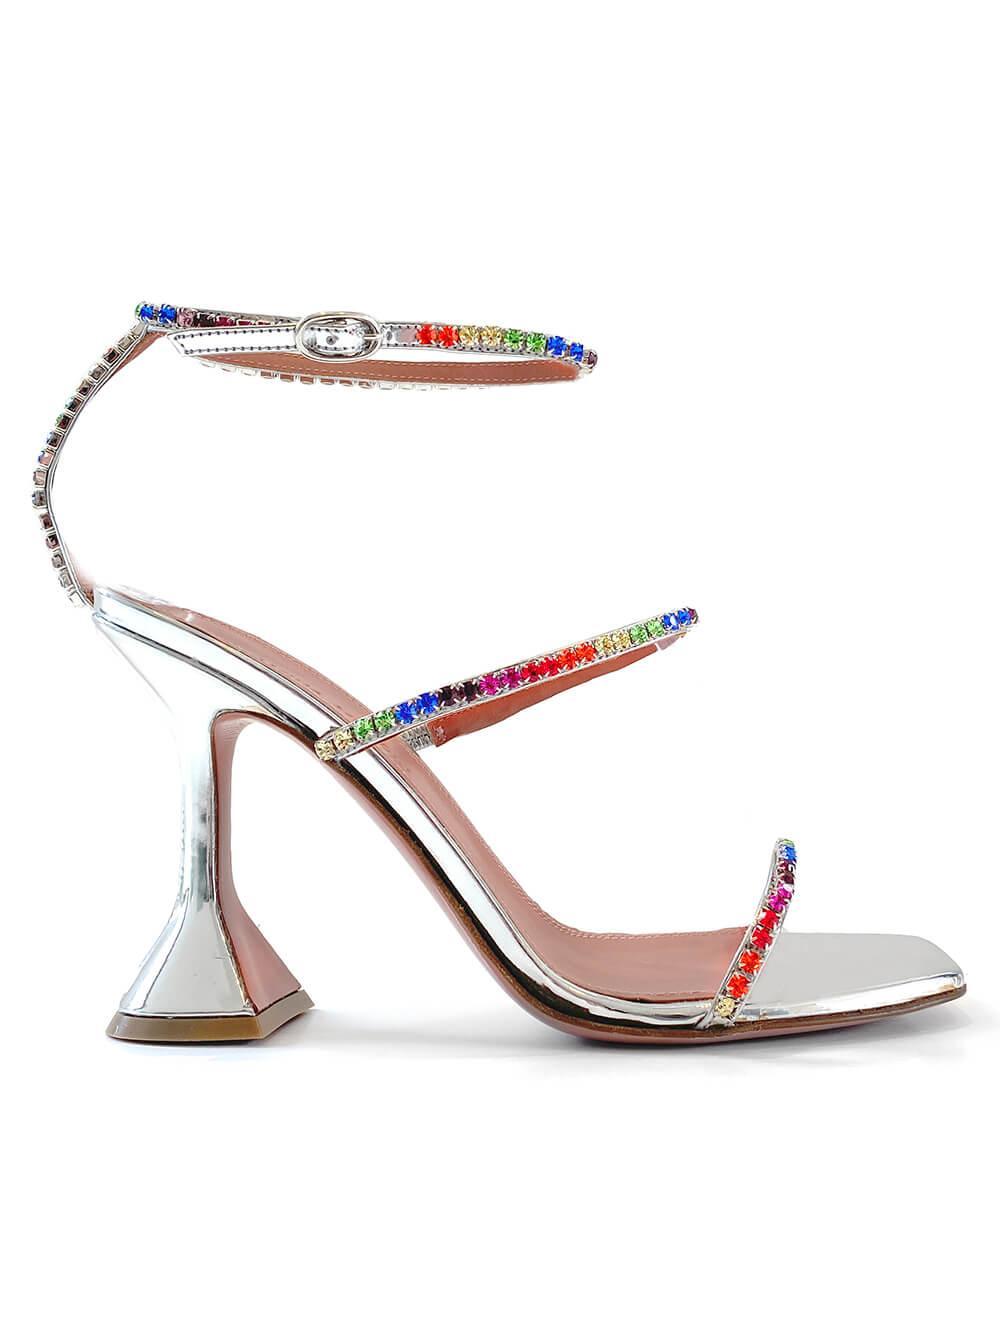 Gilda Sandal With Rainbow Crystals Item # GILDA-SANDAL